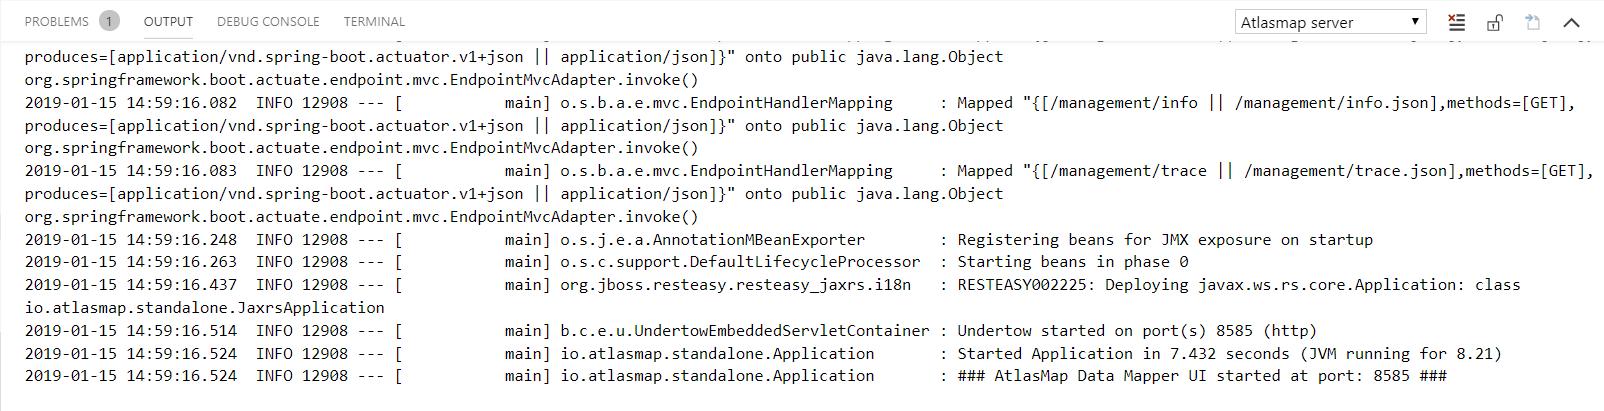 AtlasMap Server output